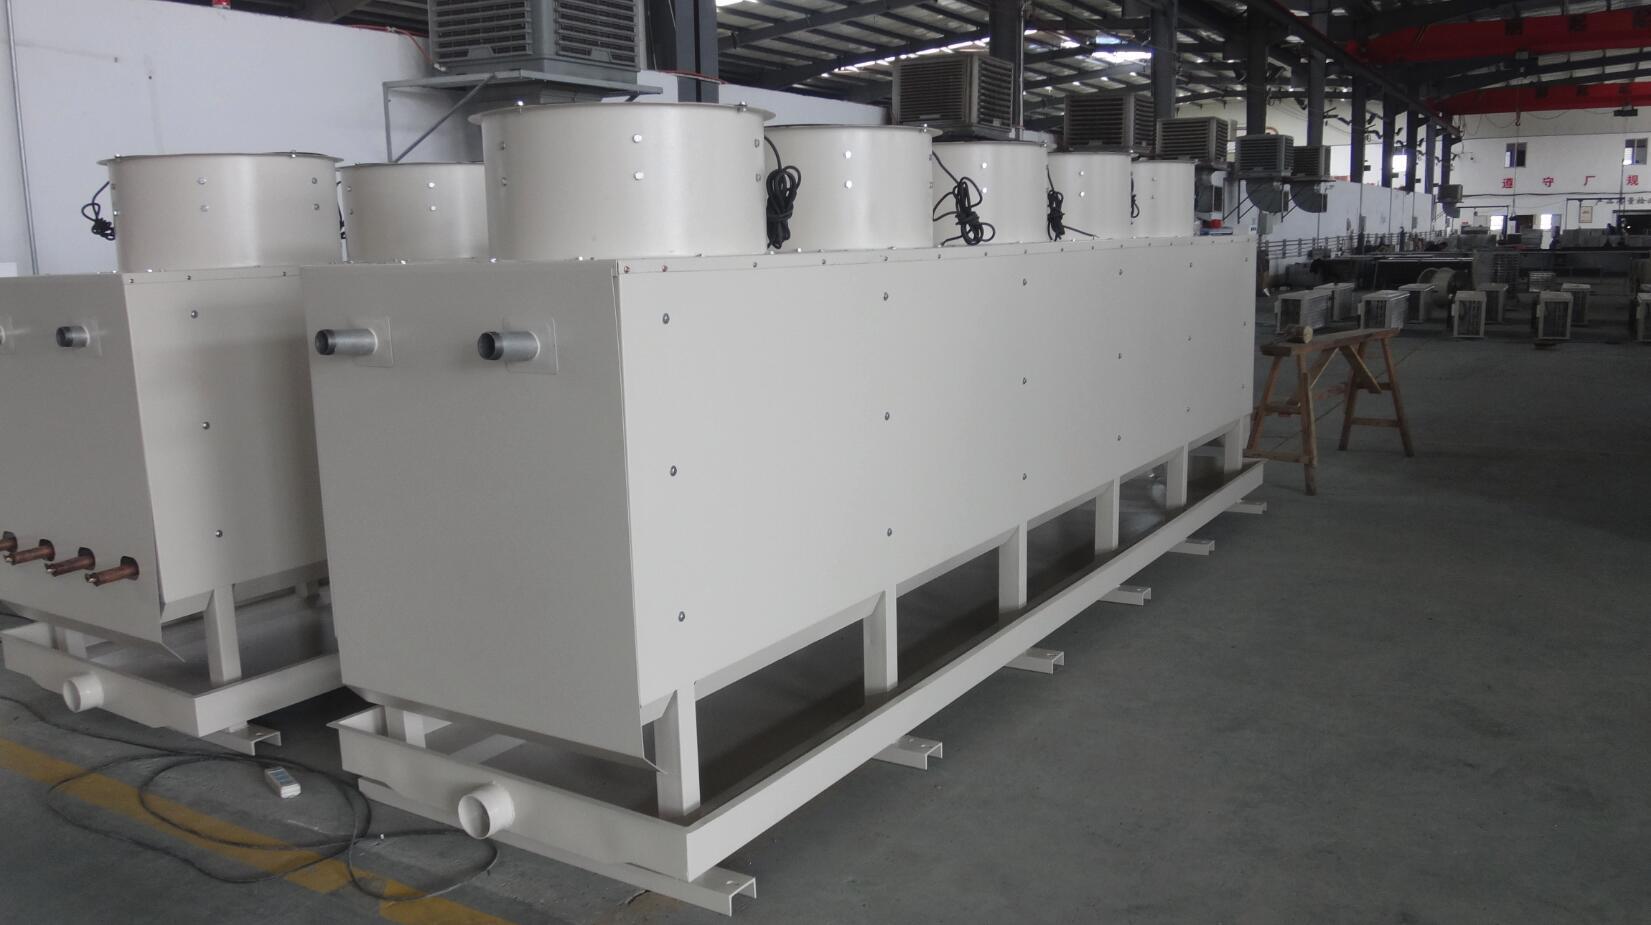 China Hot Sale Floor Standing Air Cooler Evaporator for Freezer Room